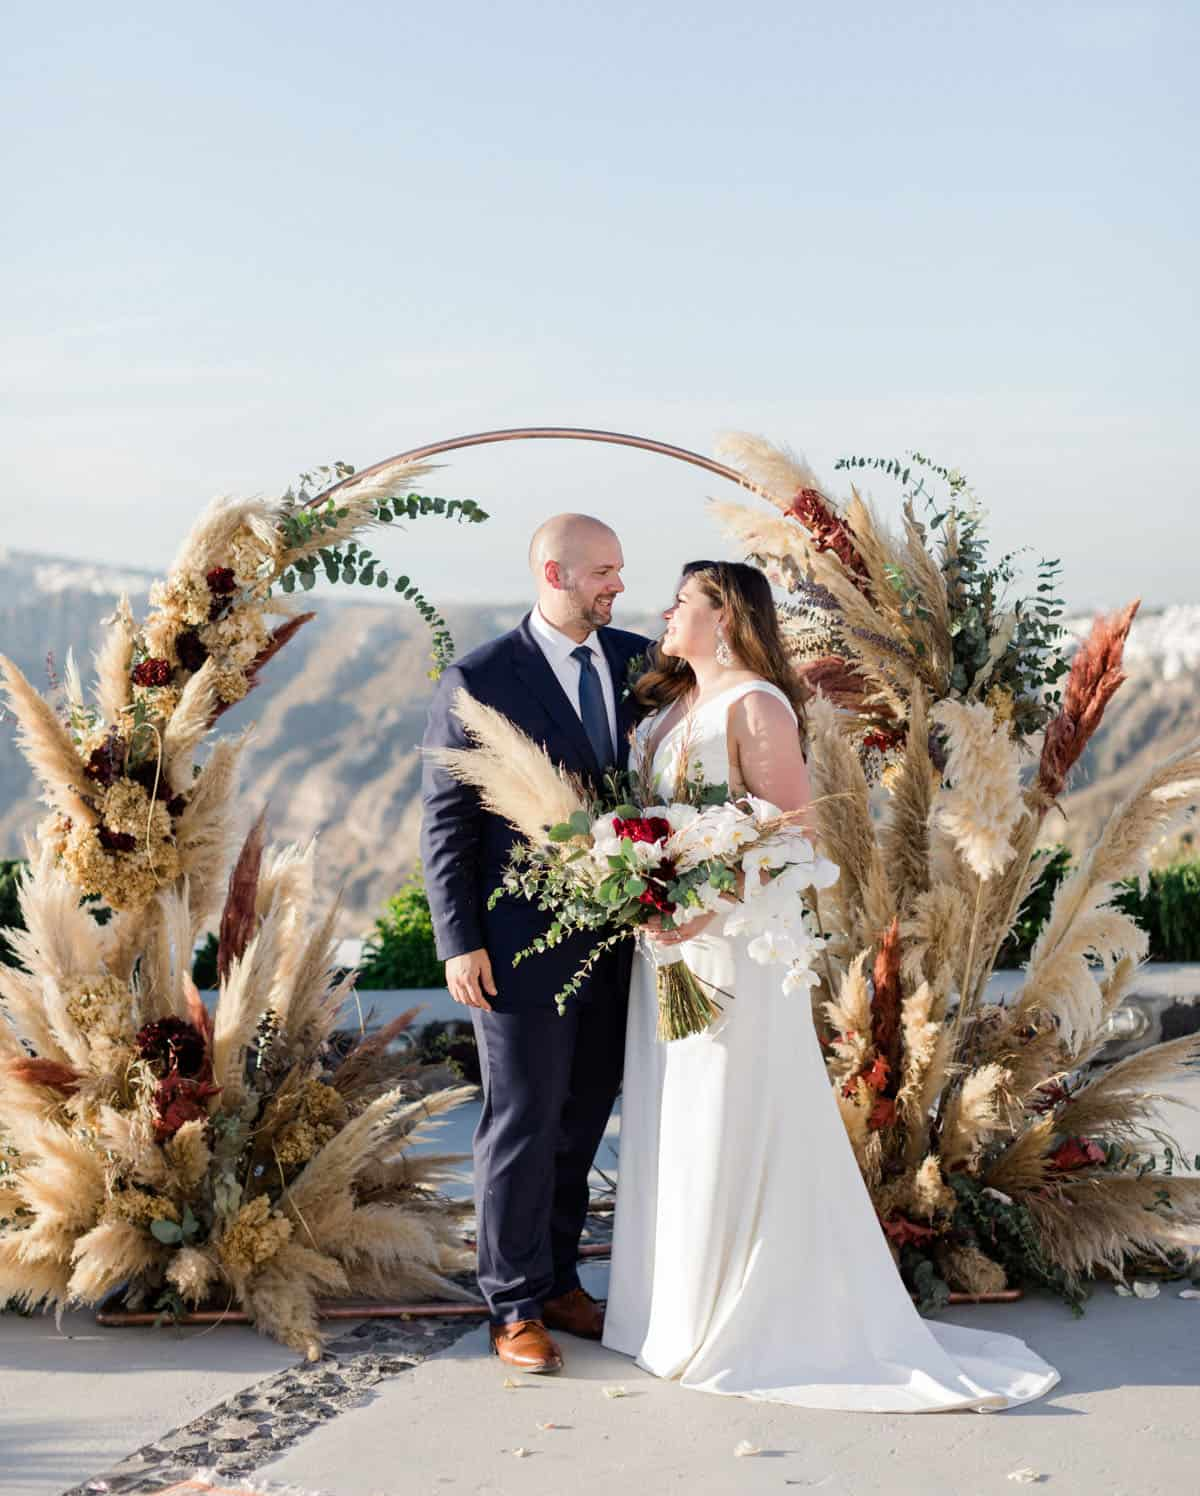 arco de casamento geométrico